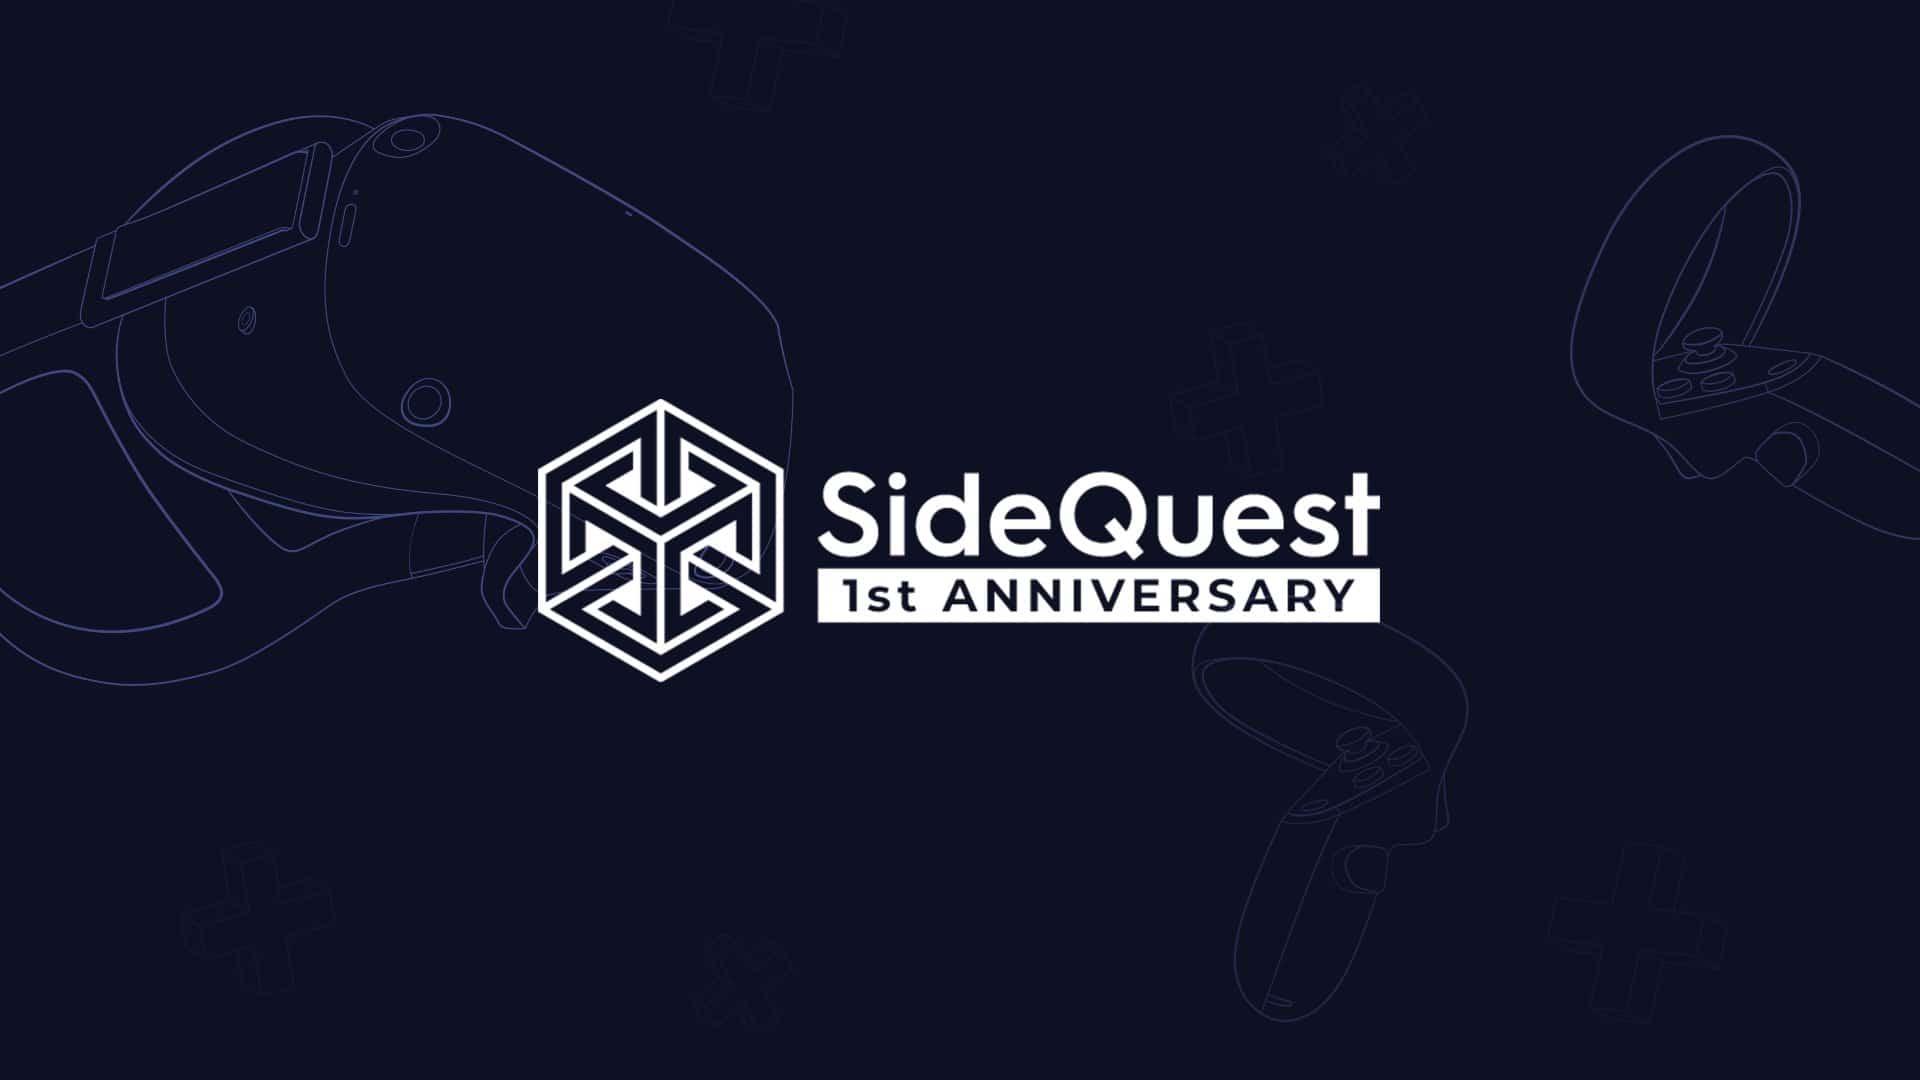 SideQuest 获得300万美元种子轮融资,月活已超过100万